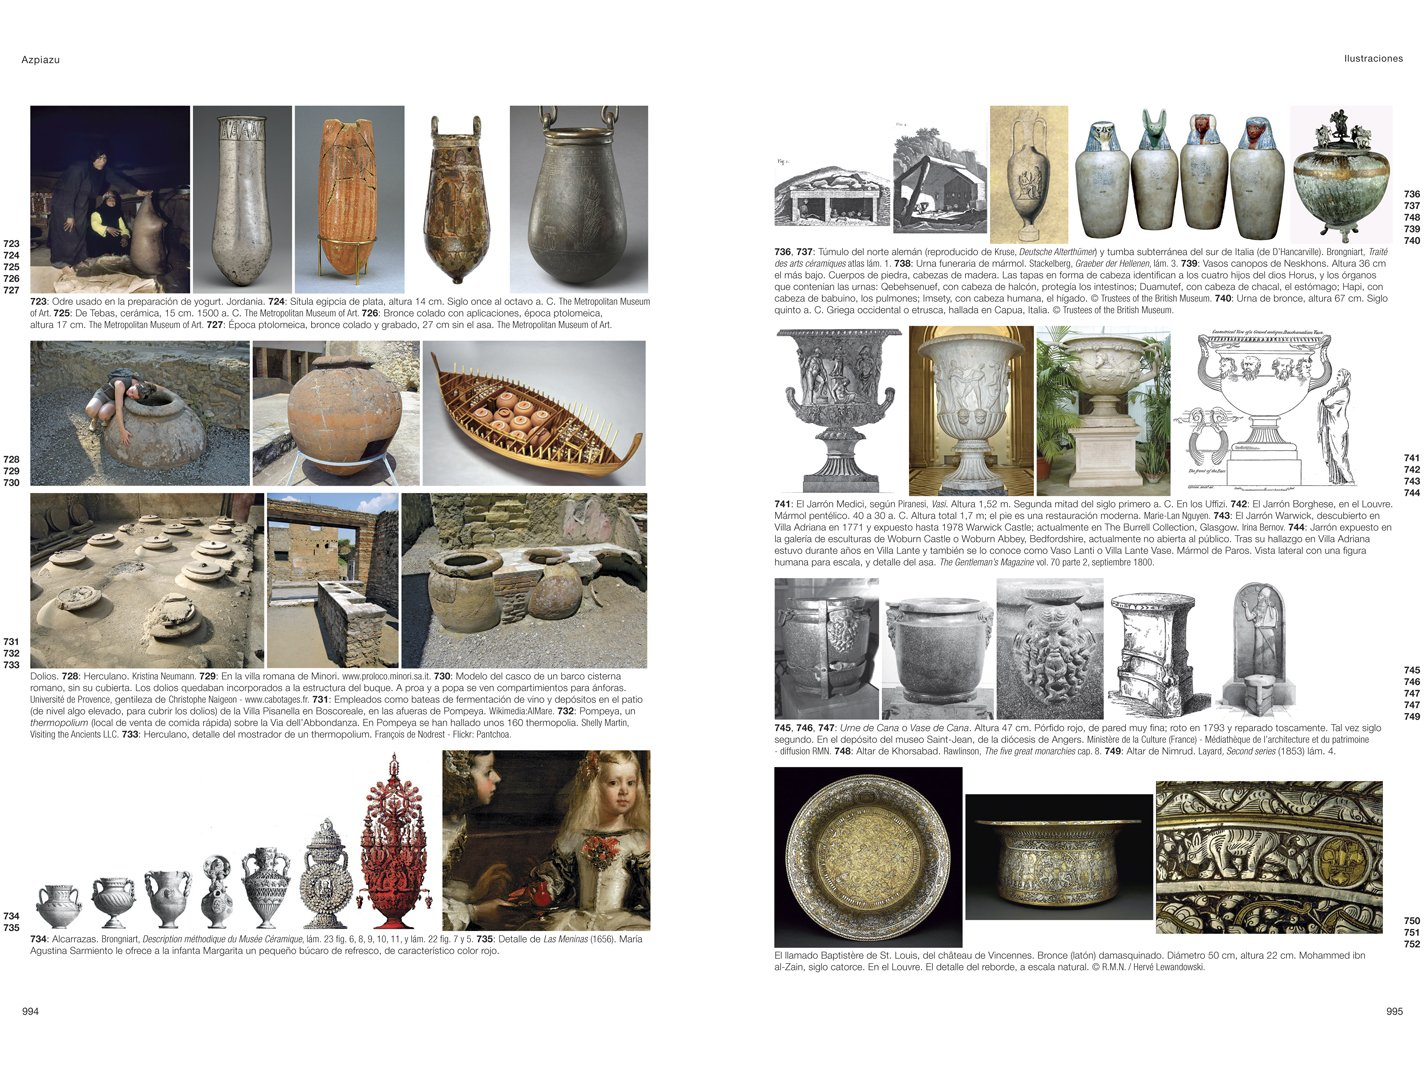 Semper: El estilo [en caja] (Spanish Edition): Gottfried Semper, Juan Ignacio Azpiazu: 9789872876623: Amazon.com: Books